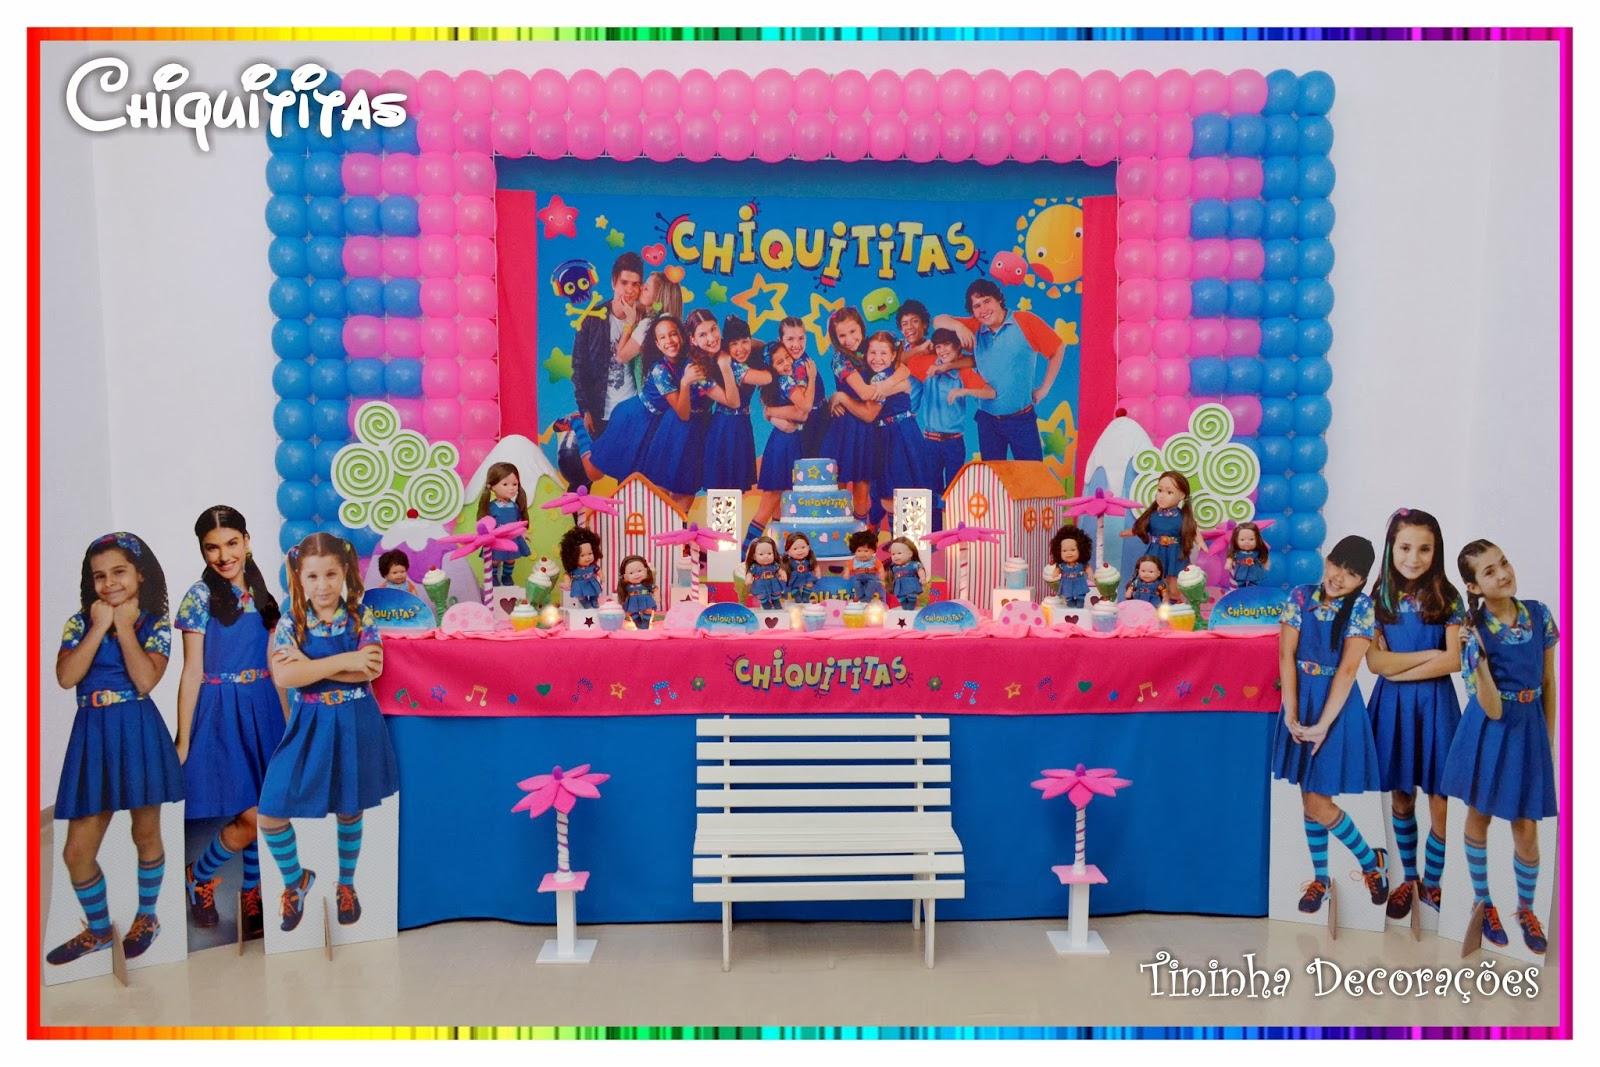 decoracao festa chiquititas:Tininha Decorações: Chiquititas